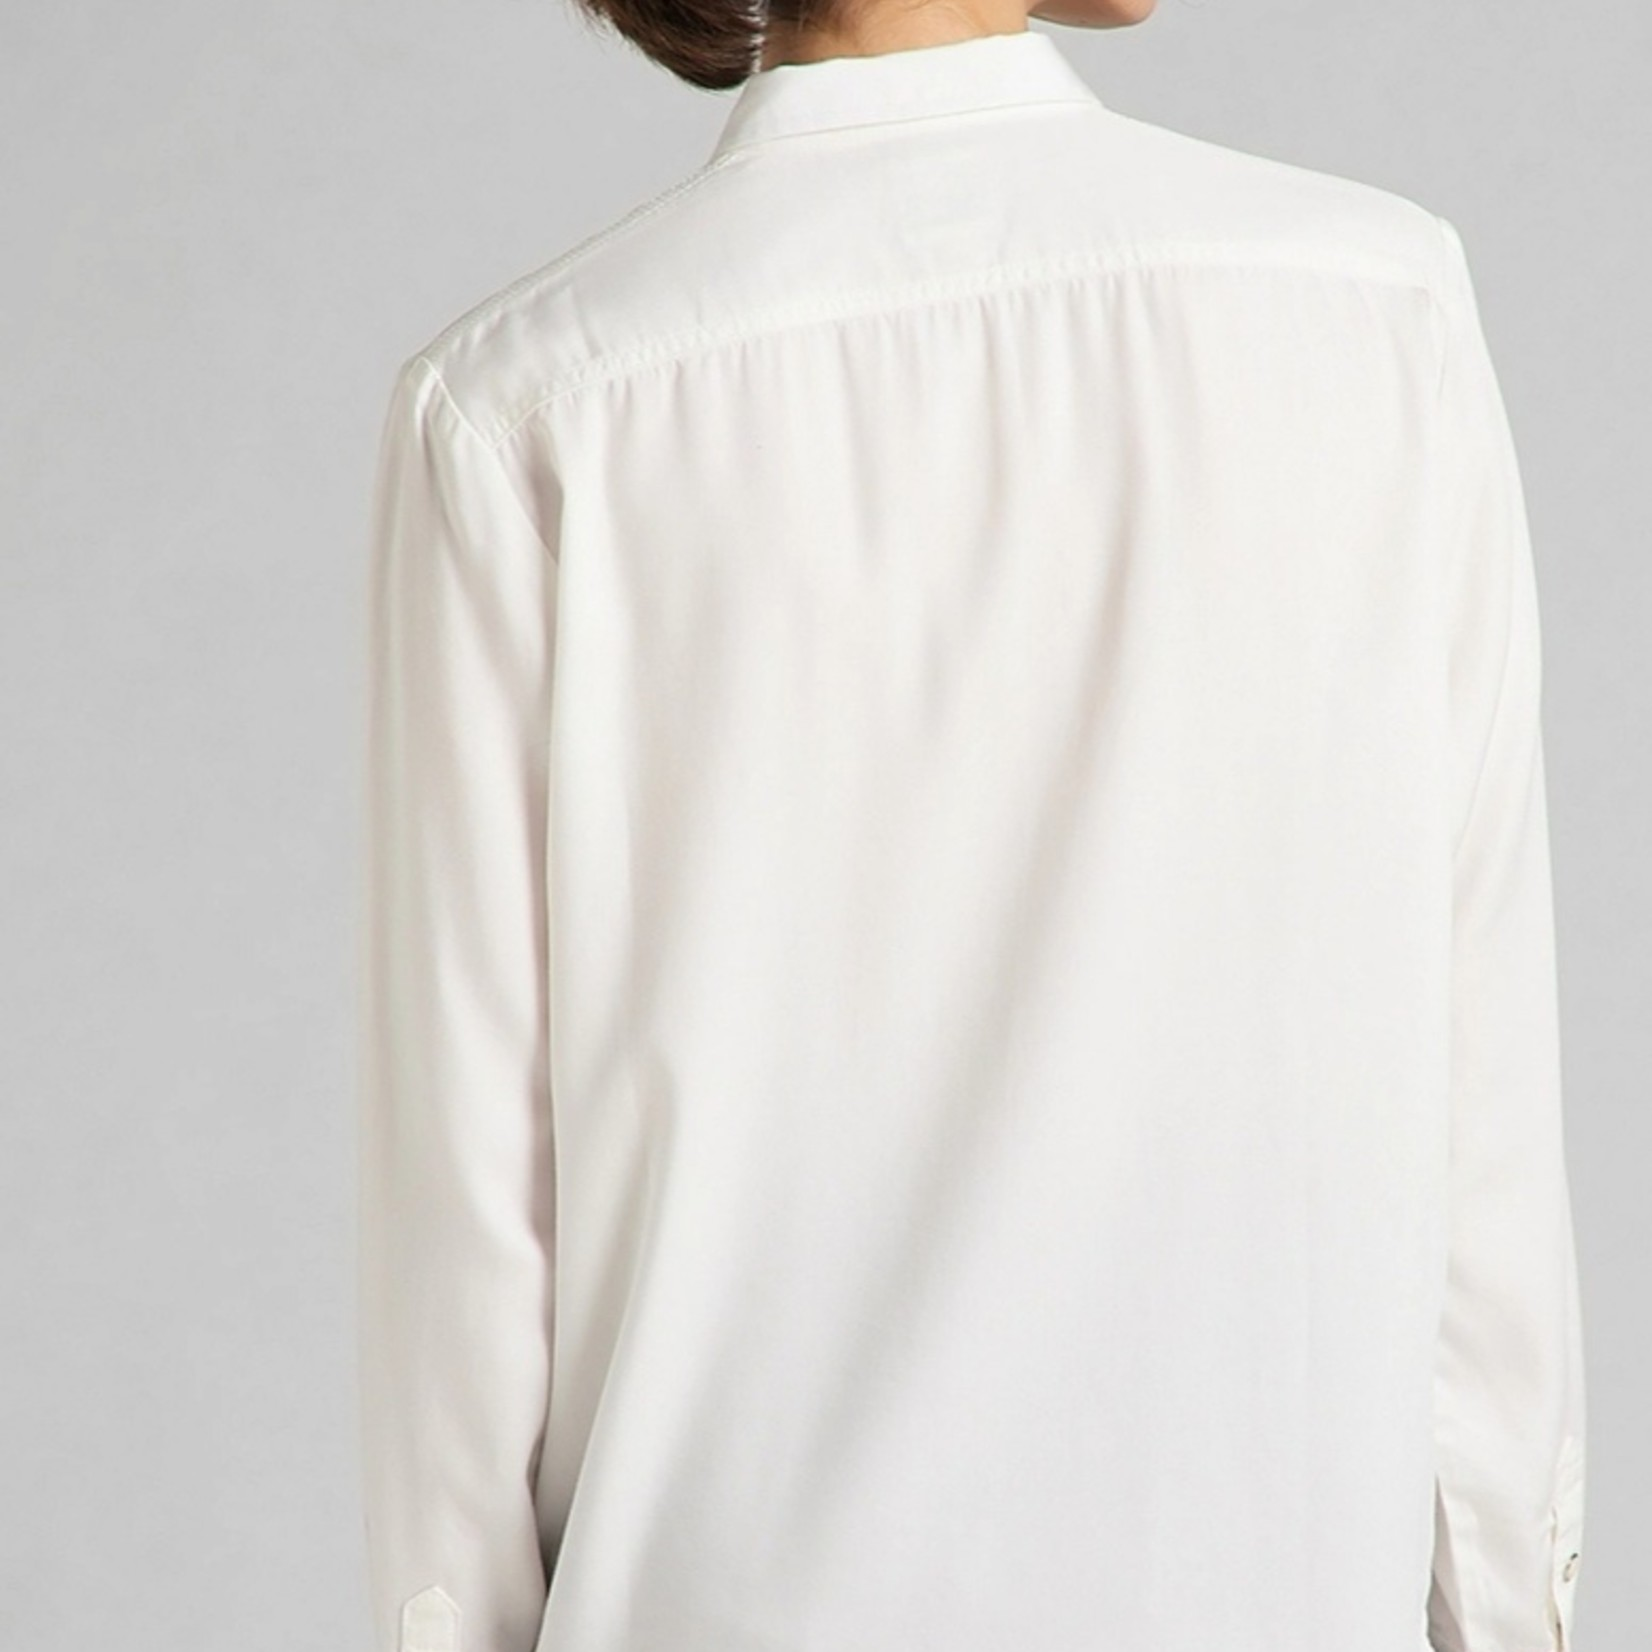 LEE WESTERN SHIRT, blouse regular fit